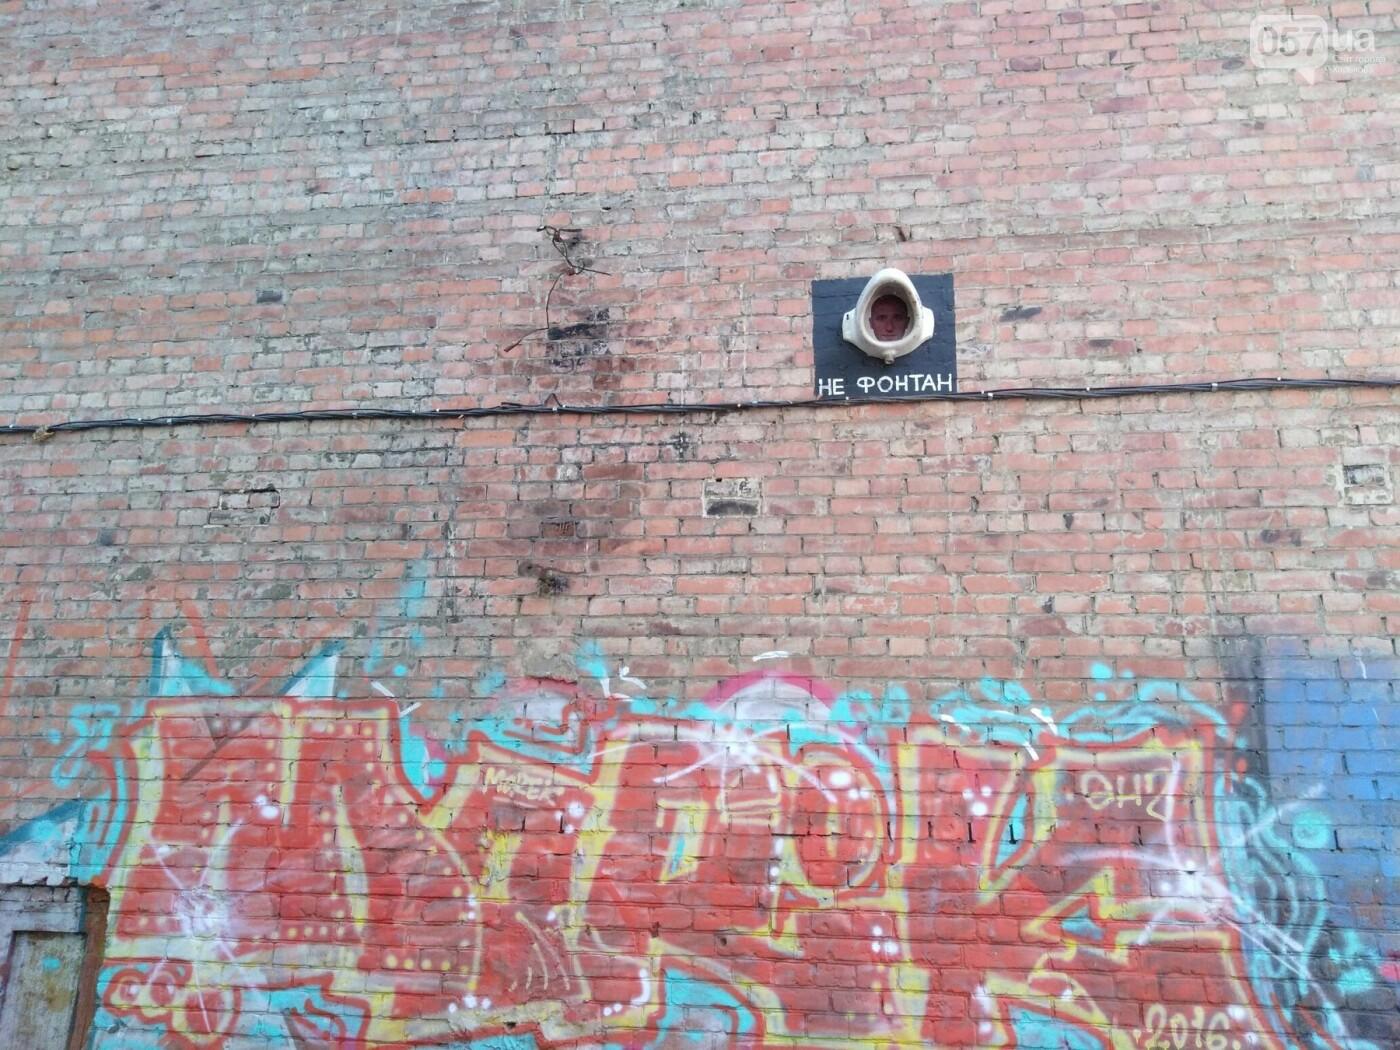 Стрит-арт Гамлета в Харькове: ТОП-10 граффити художника, - ФОТО, фото-14